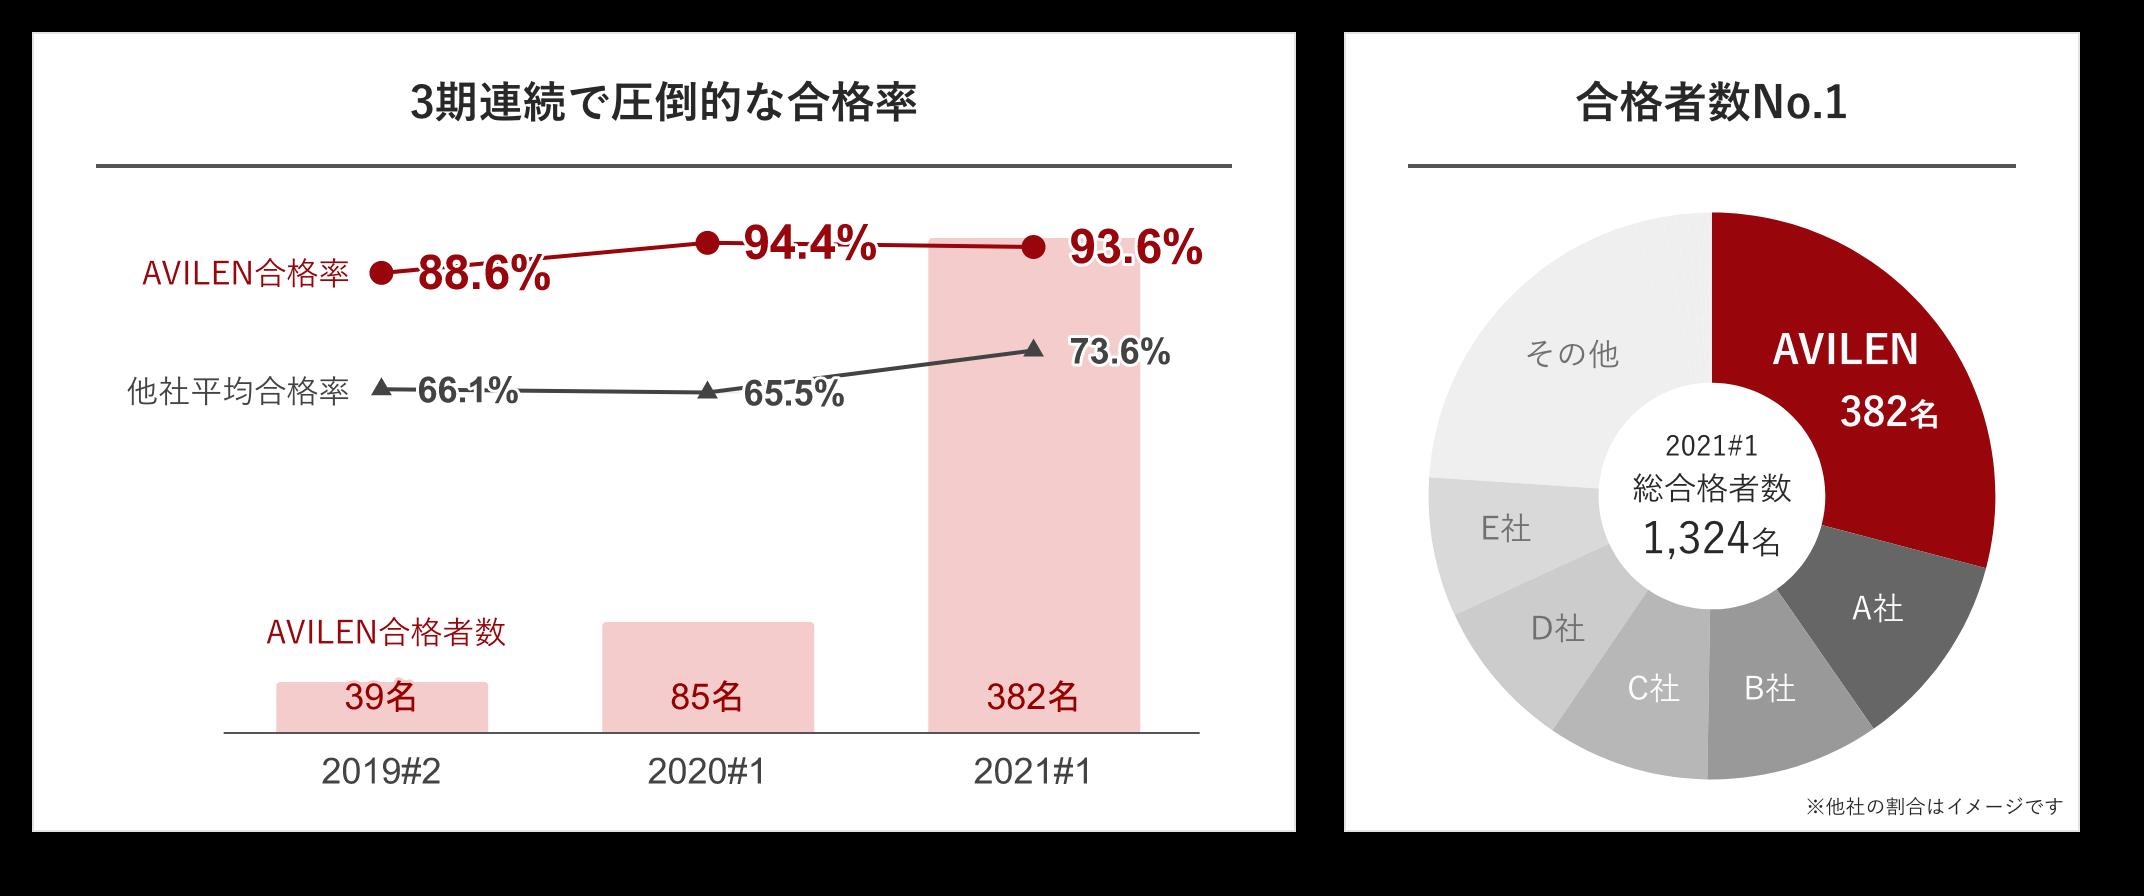 2020#1 E資格合格率グラフ 他社平均65%